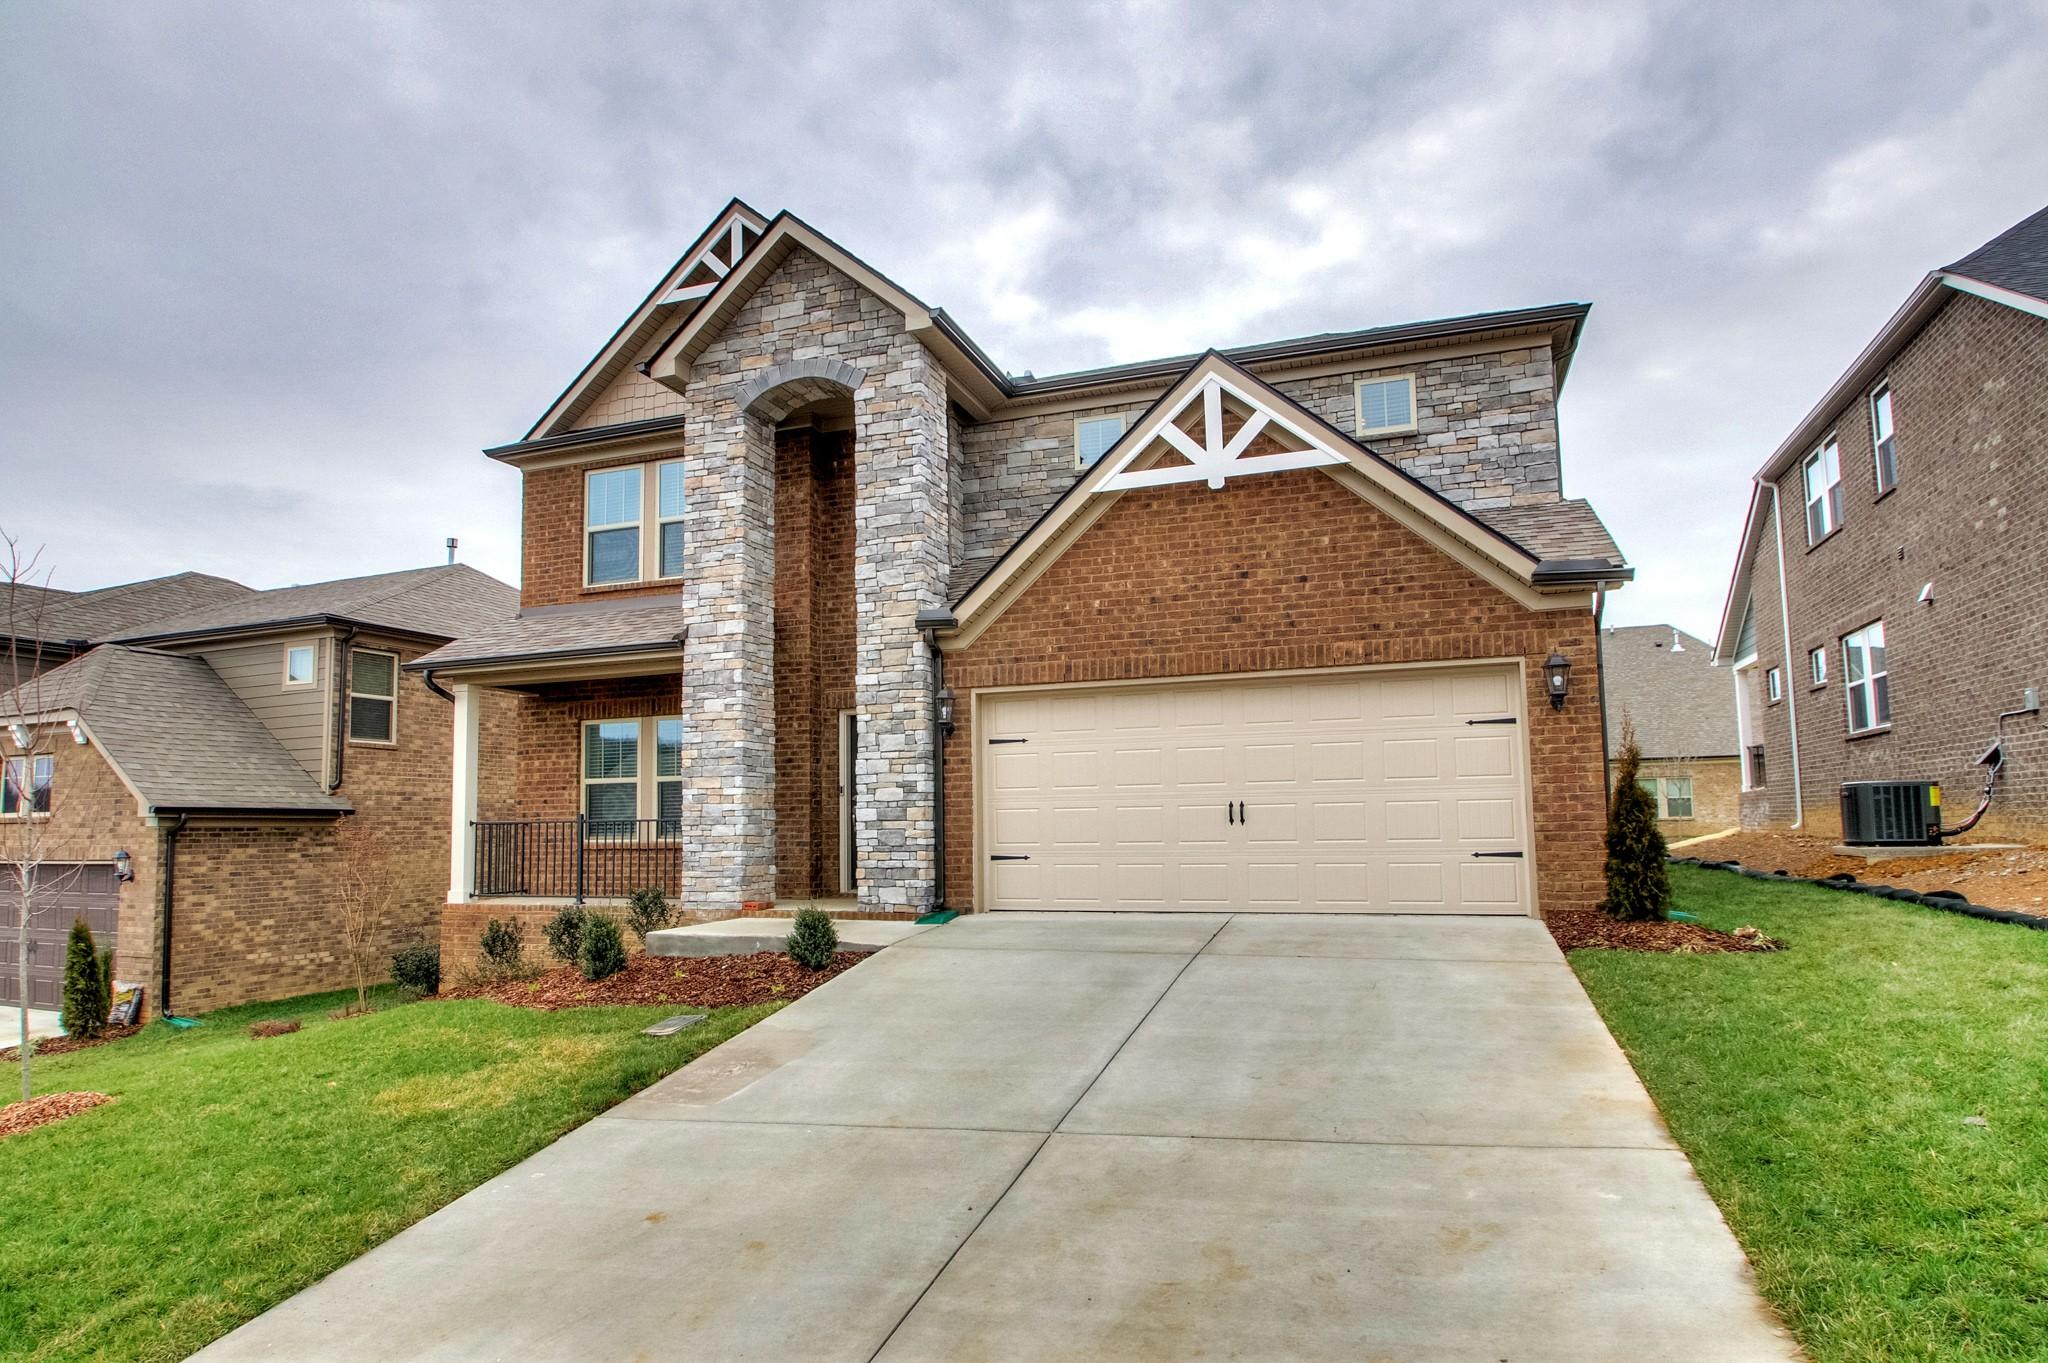 514 Fall Creek Cir, Goodlettsville, TN 37072 - Goodlettsville, TN real estate listing